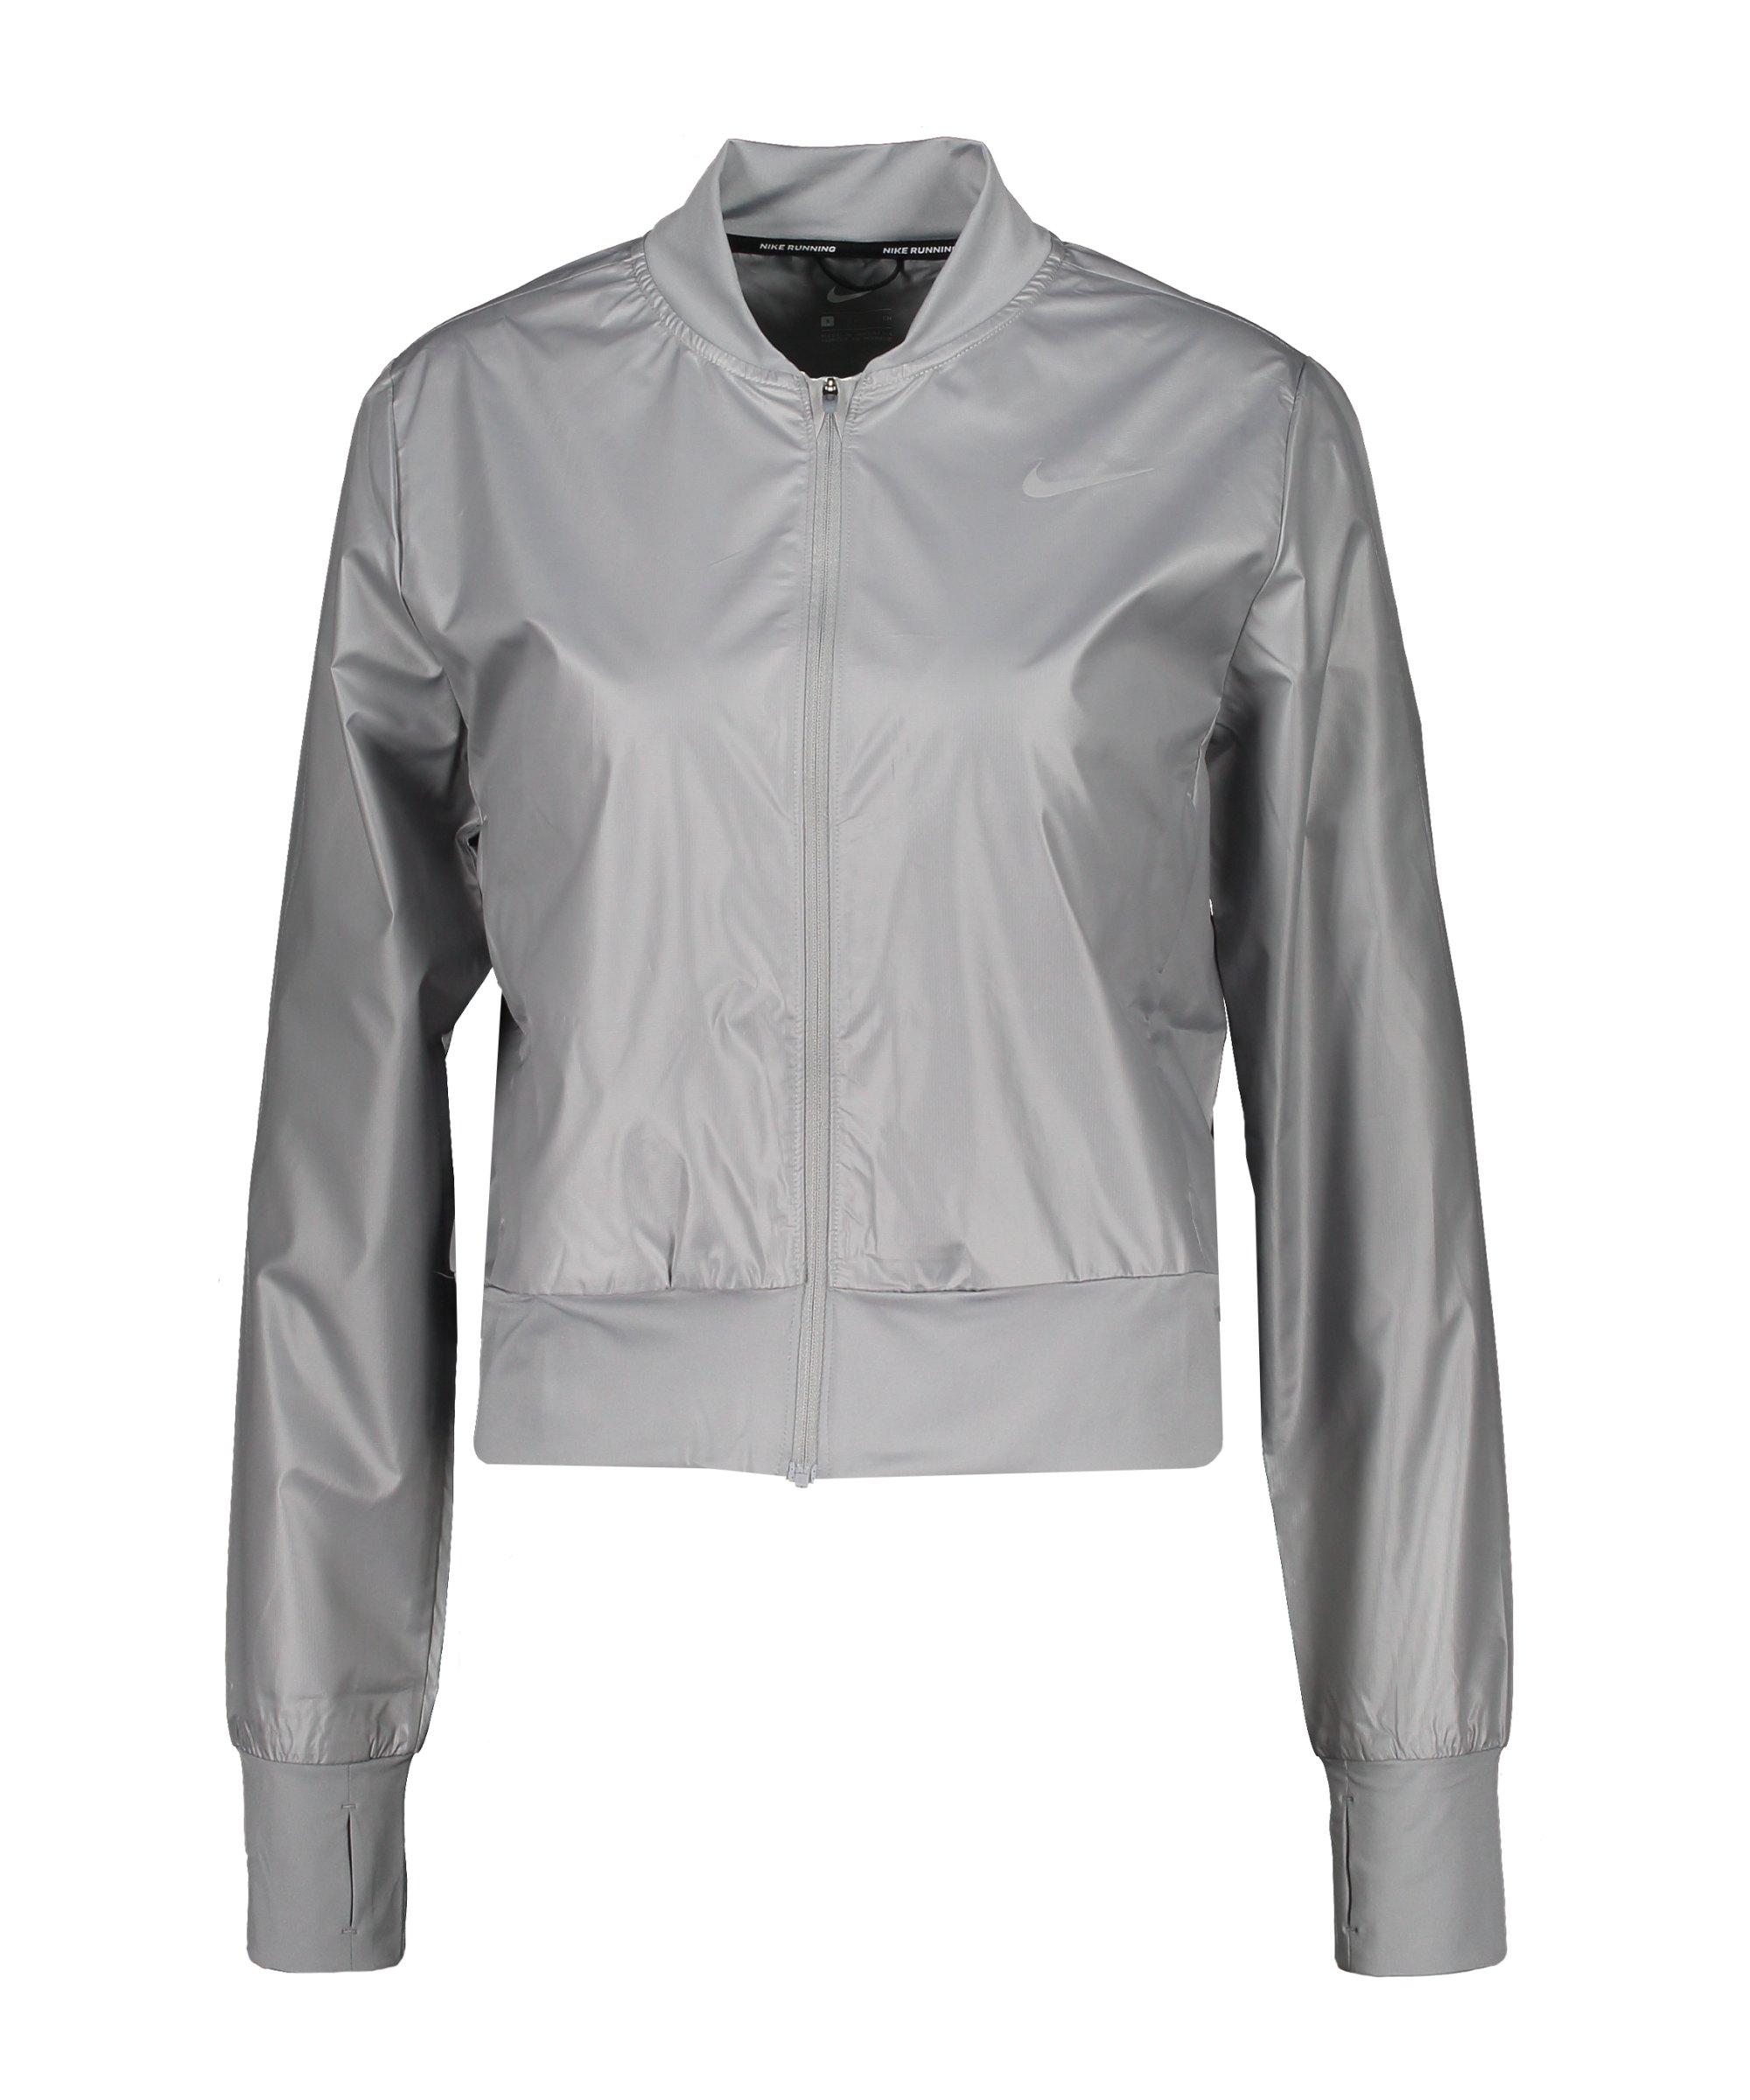 Nike Swoosh Run Jacke Running Damen Grau F073 - grau